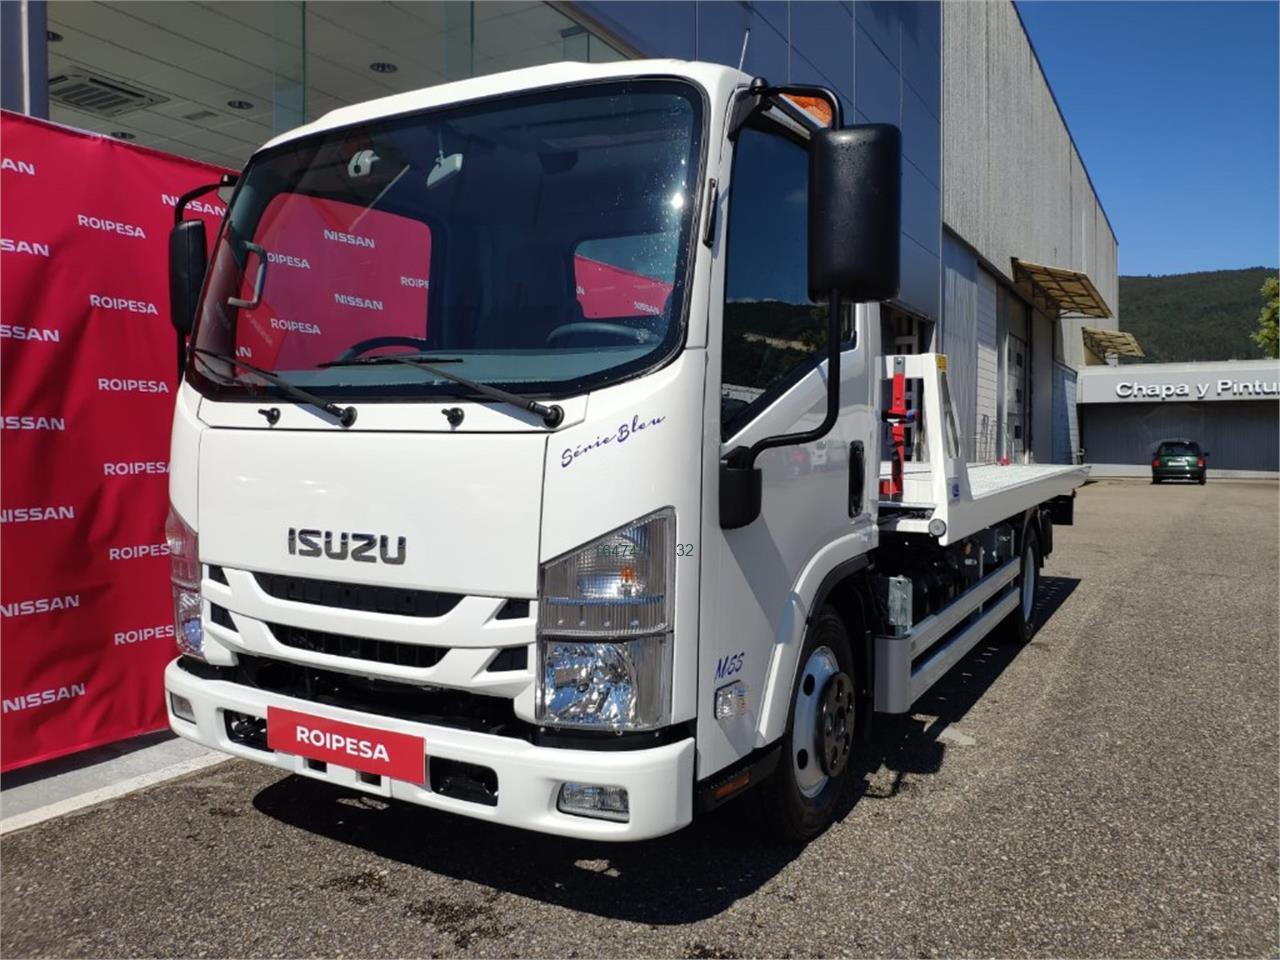 ISUZU CAMION ISUZU M55 3.0 D H 150CV GRUA PORTACOCHES de venta de venta por 46200